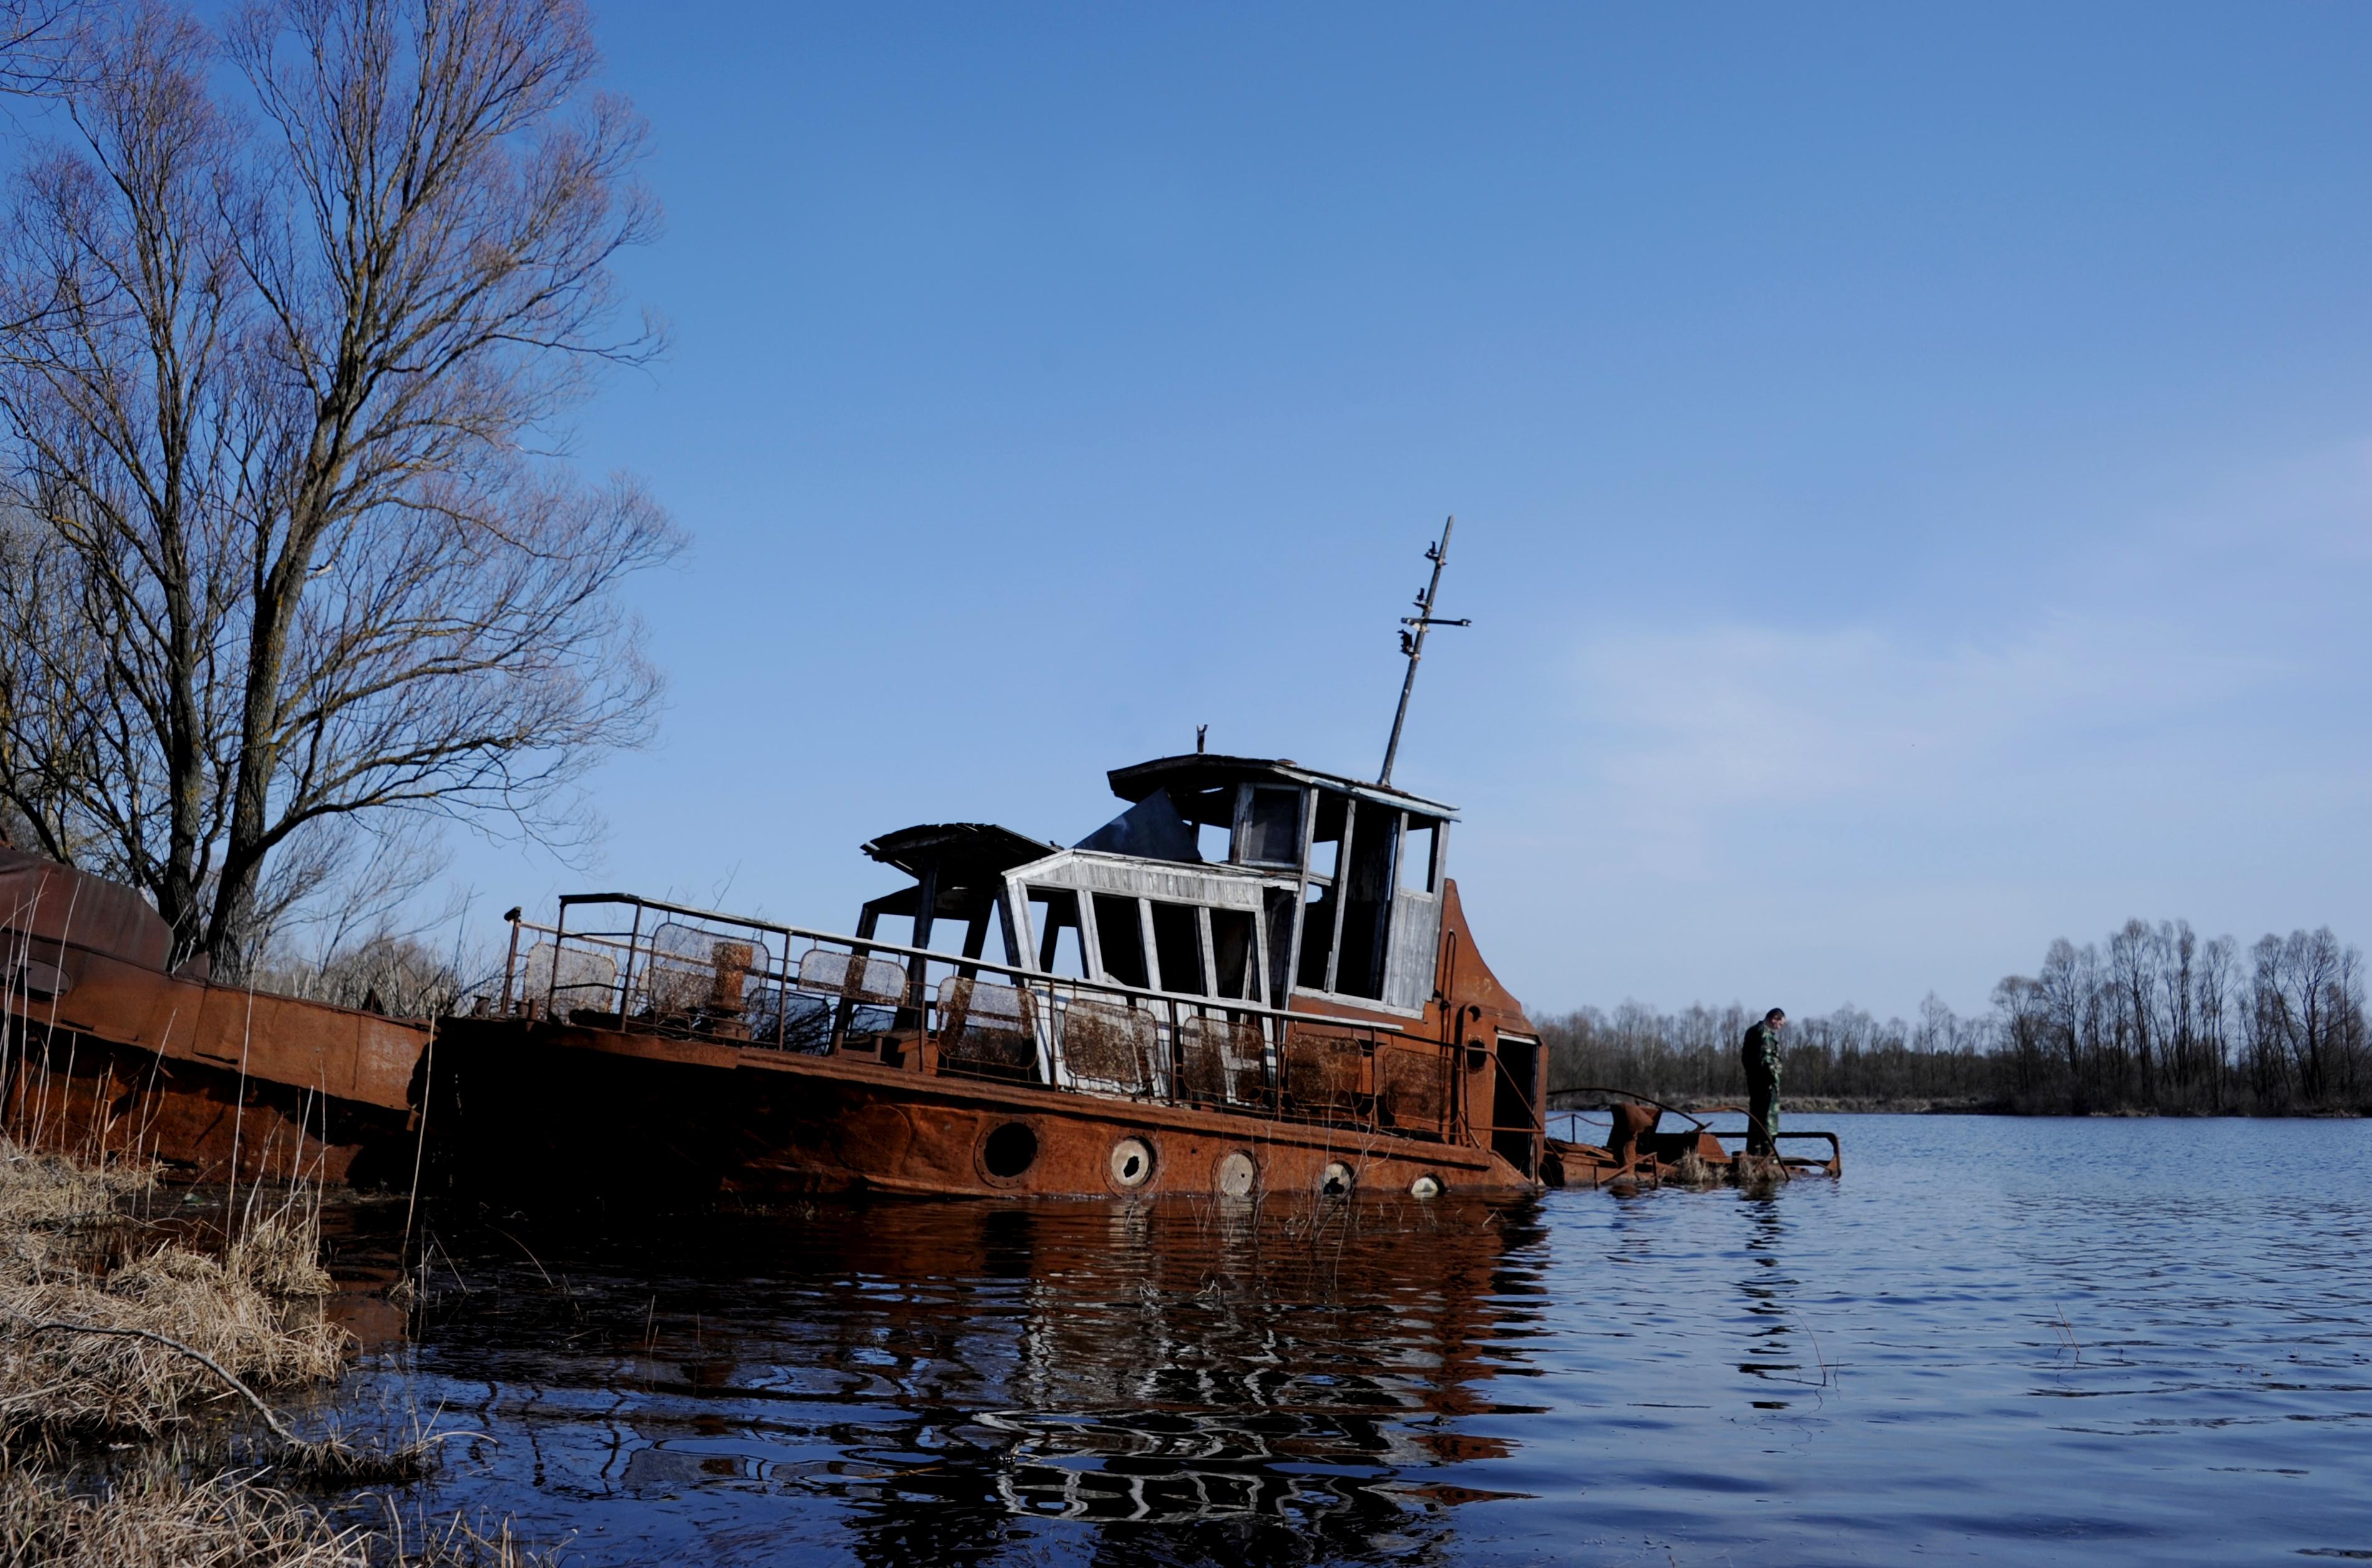 Radioaktív sárral támadhat újra Csernobil